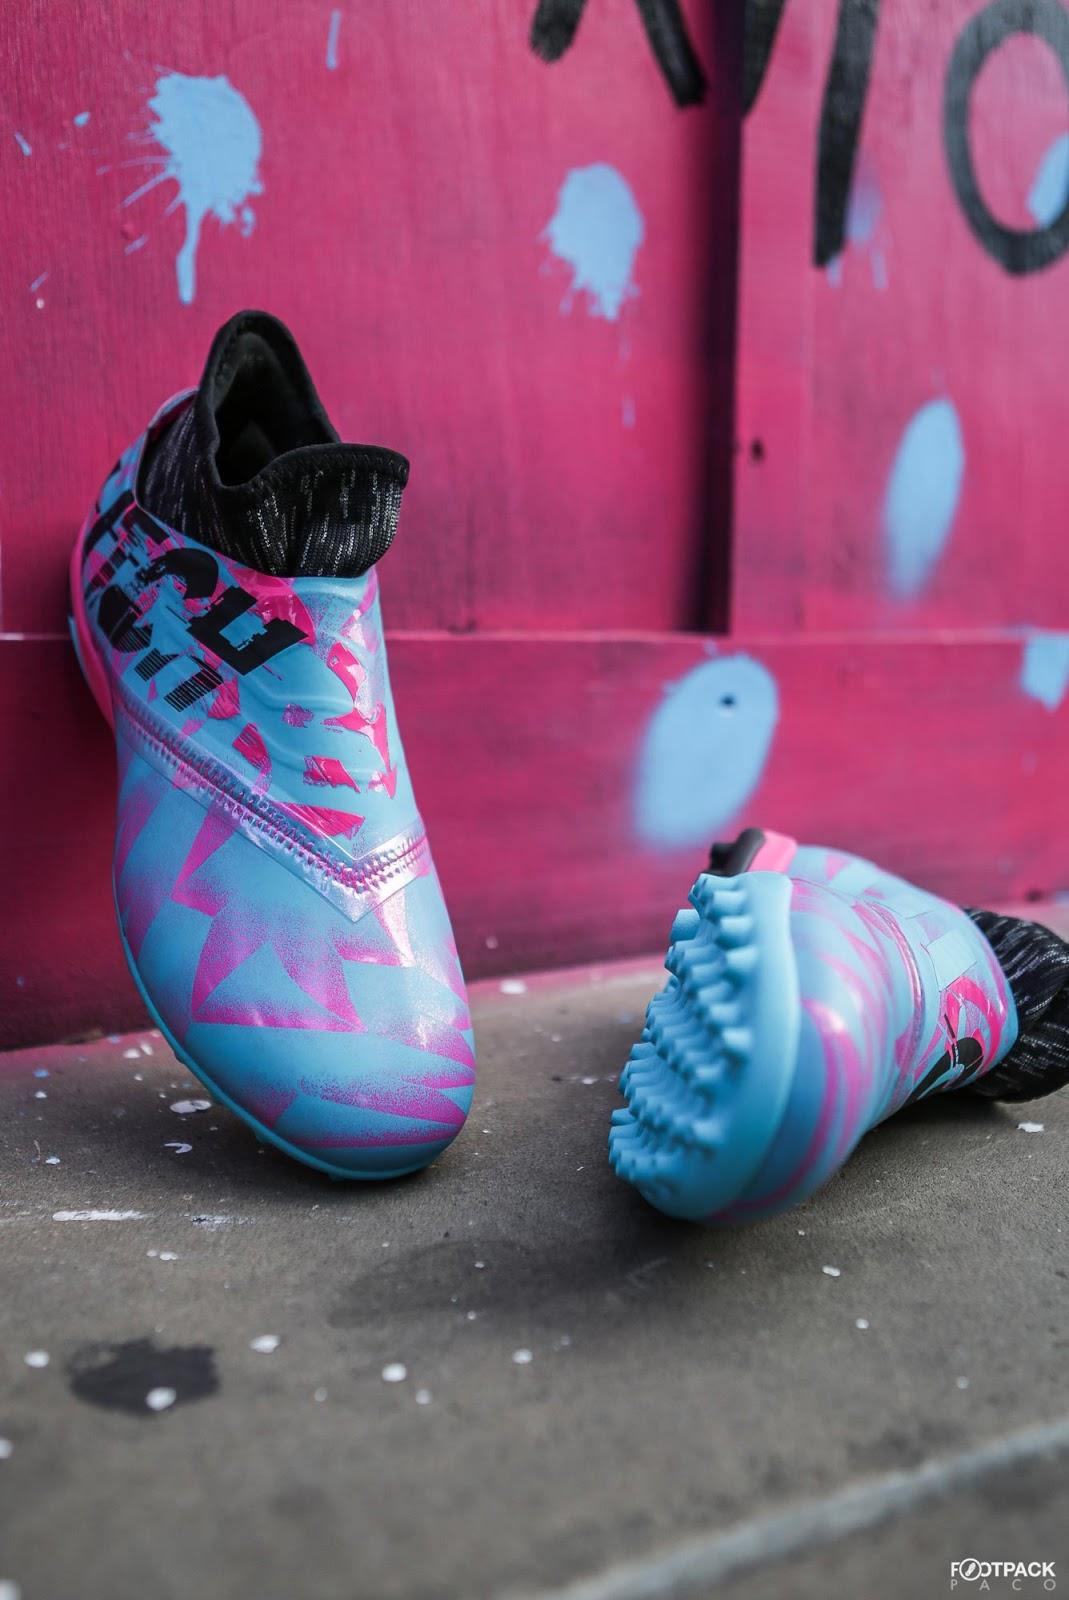 diseño atemporal adecuado para hombres/mujeres mejor selección de First-Ever Adidas Glitch Turf Boot Skins Released - cheap soccer ...